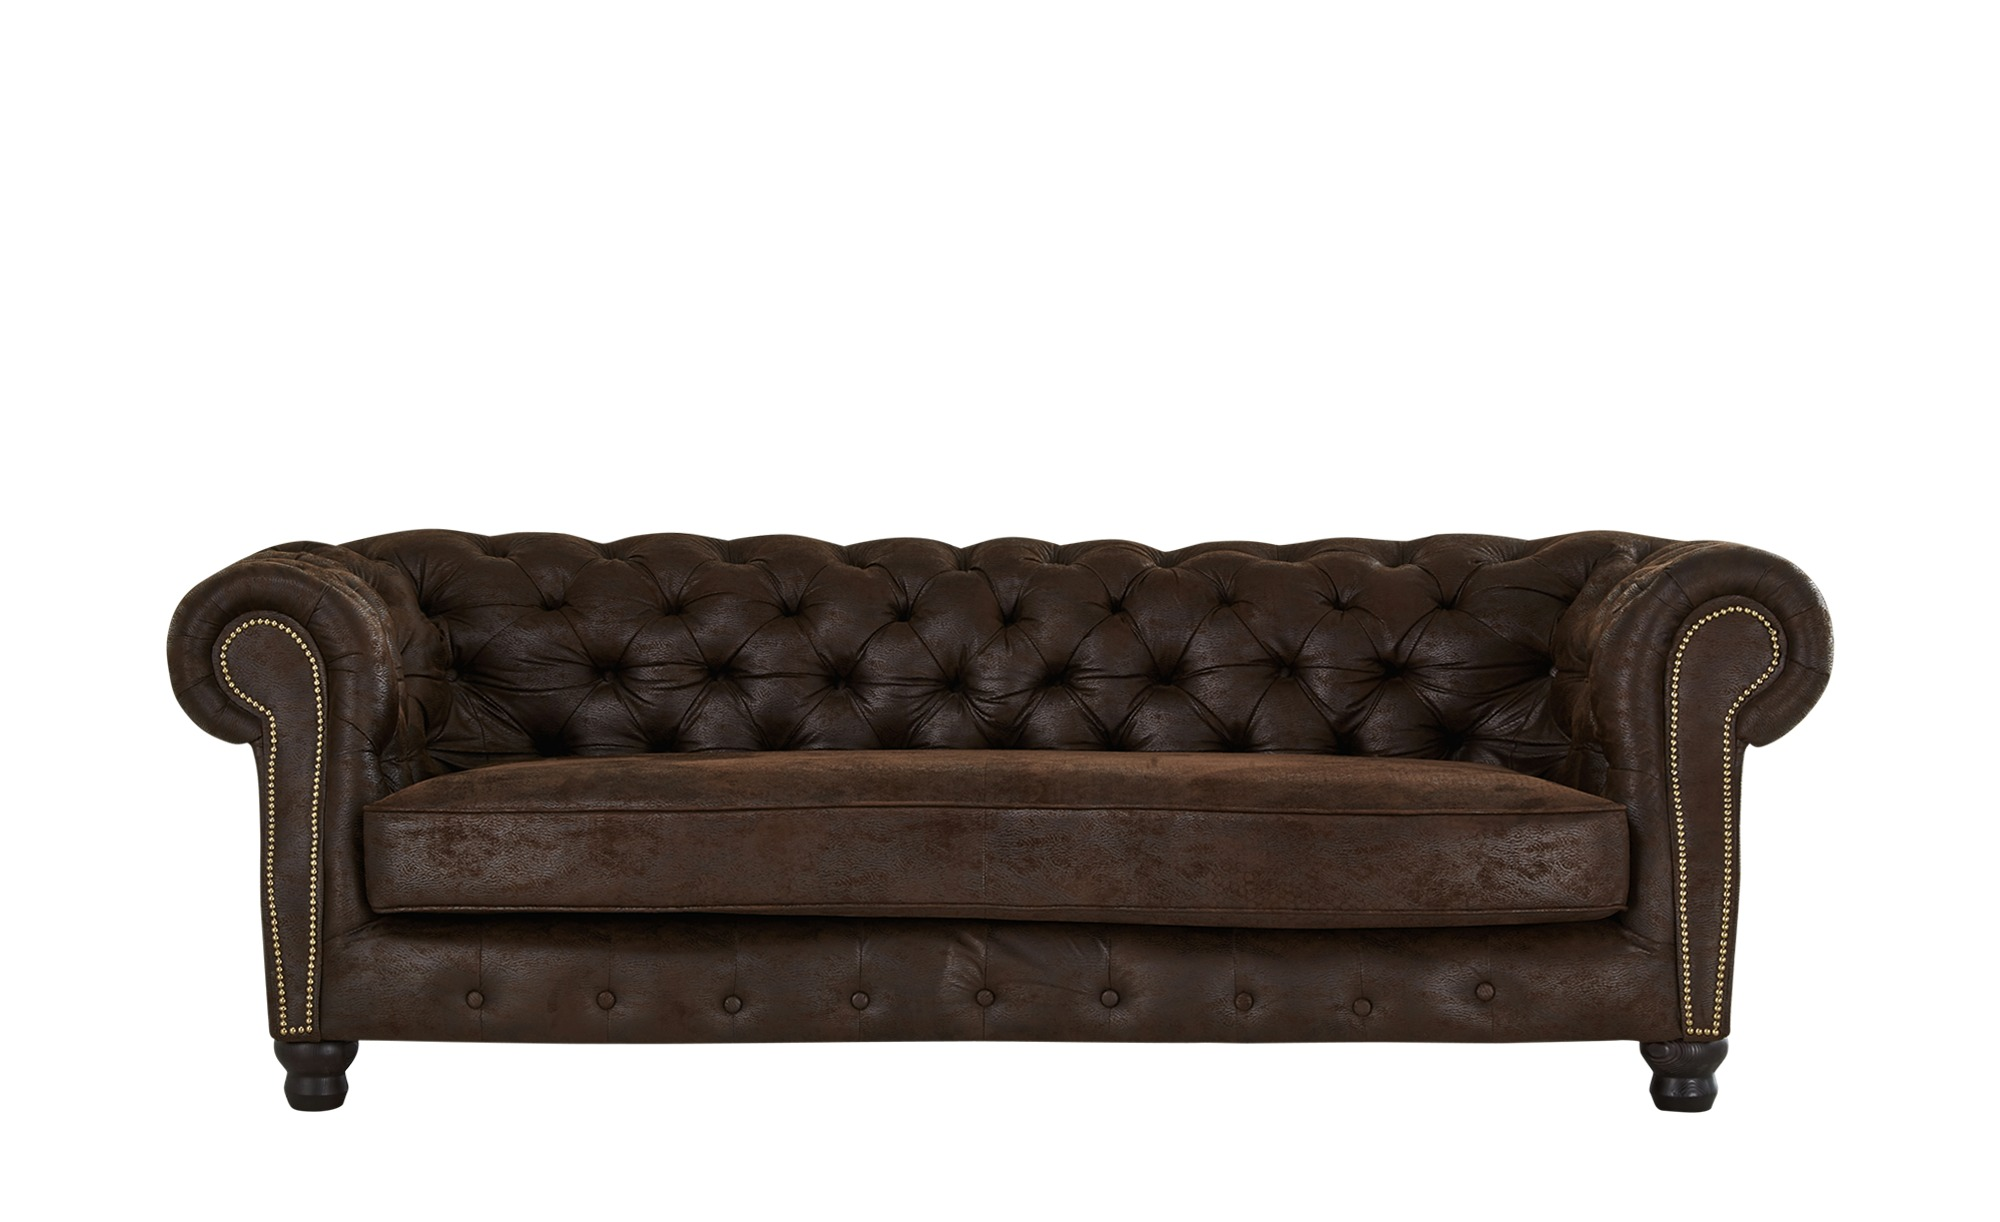 Sofa  Kingsley ¦ braun ¦ Maße (cm): B: 223 H: 75 T: 107 Polstermöbel > Sofas > Einzelsofas - Höffner